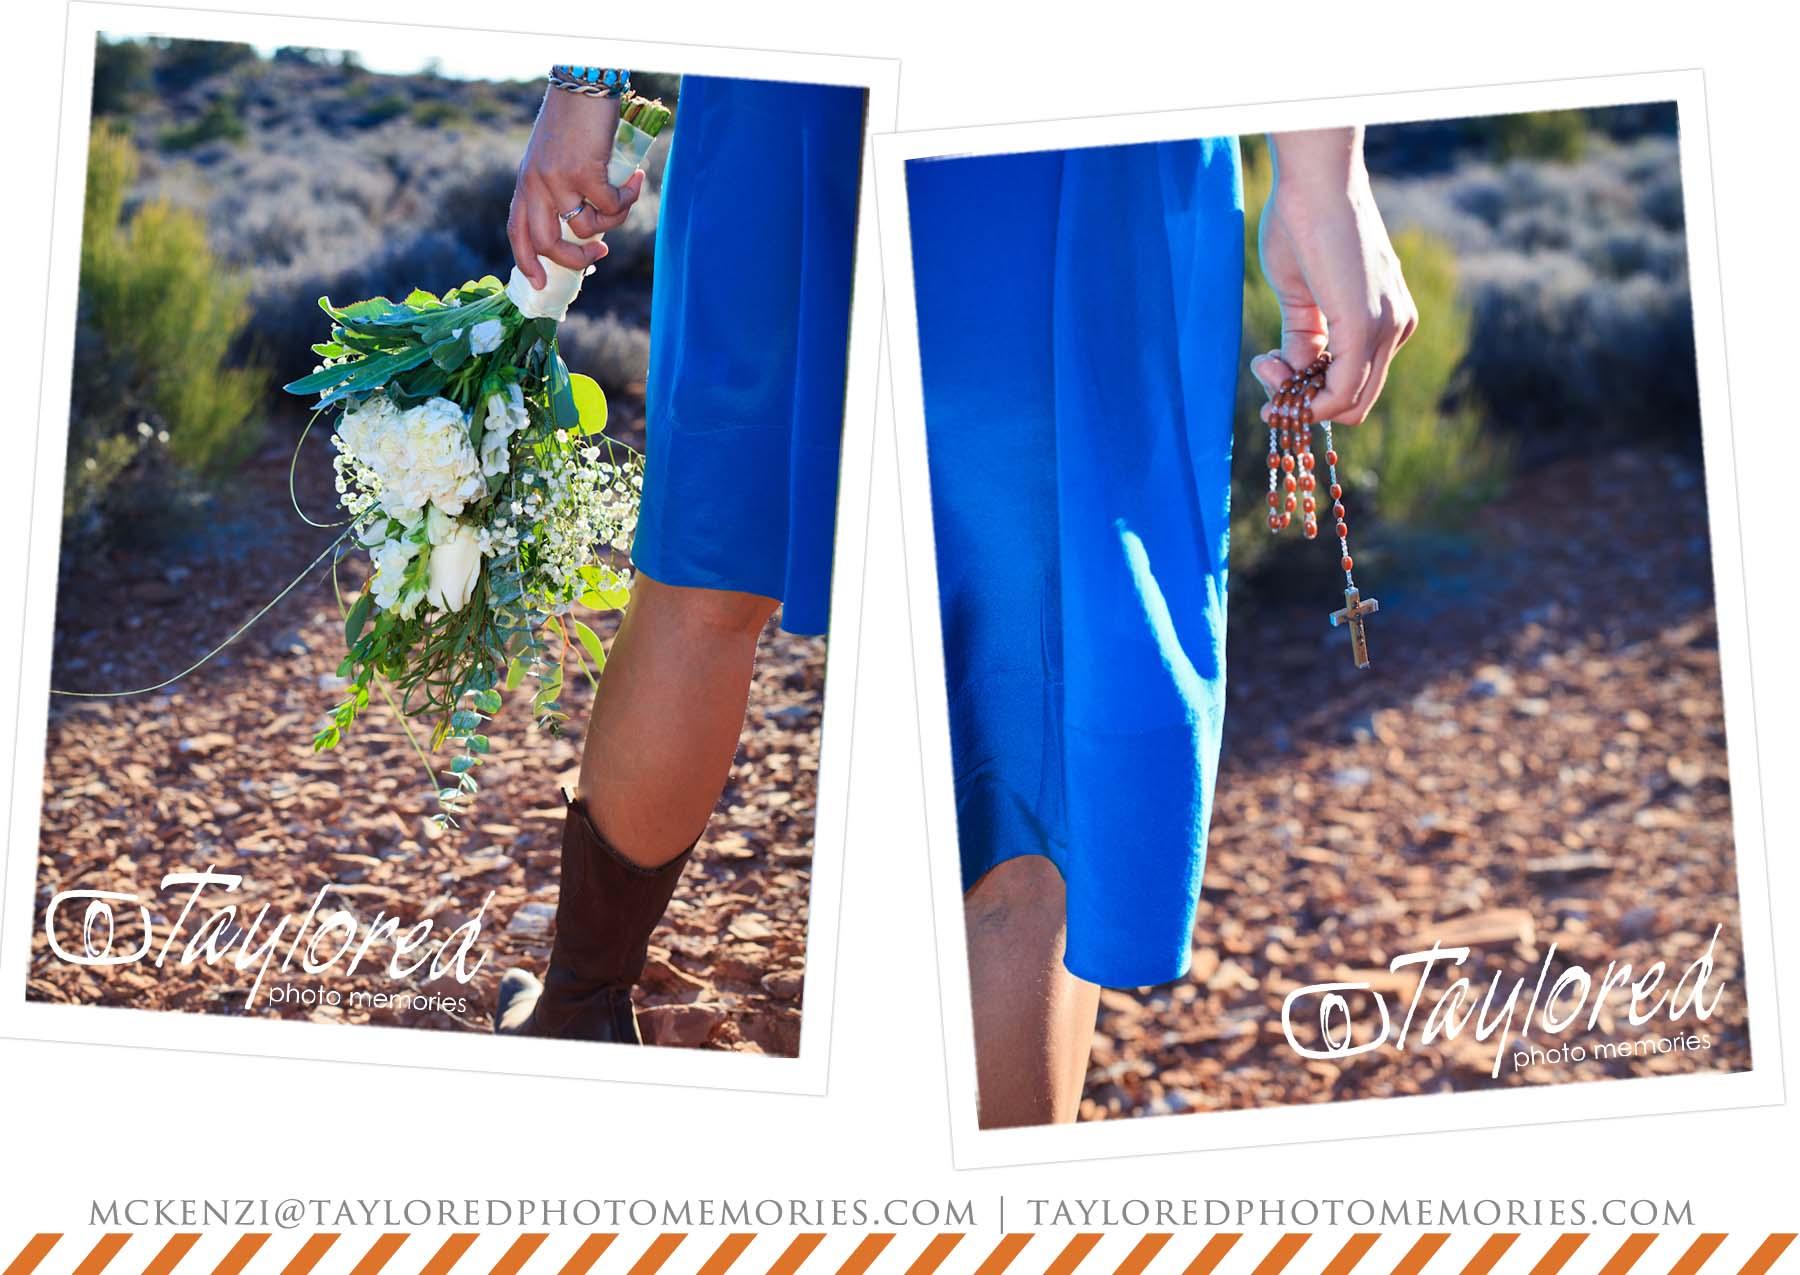 Elope in Las Vegas | Adventure Wedding Ideas - Taylored Photo Memories